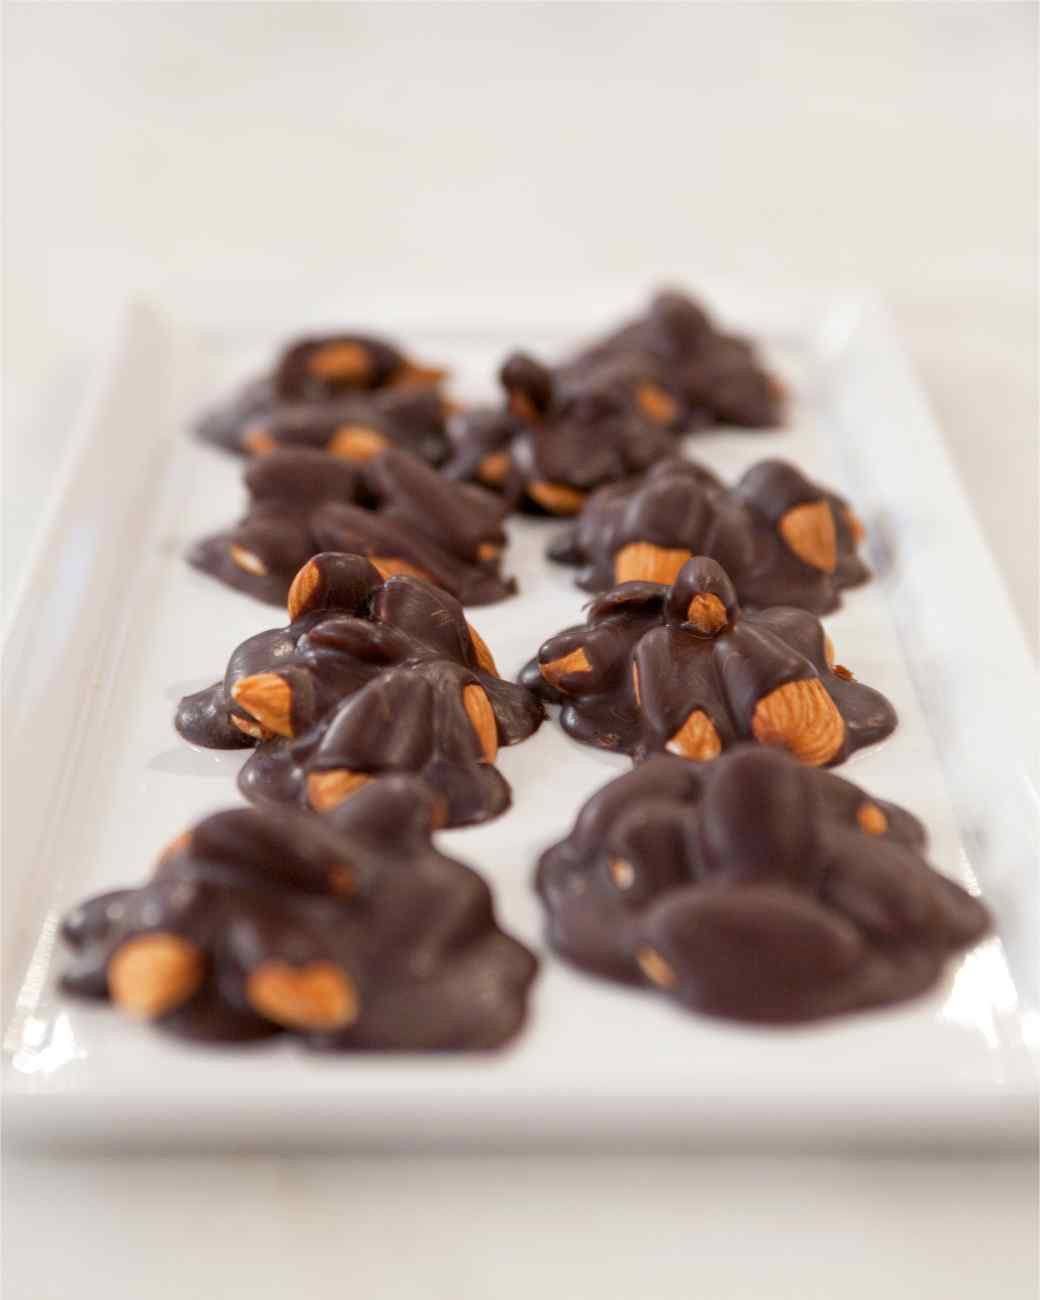 Healthy Chocolate Snacks Recipes  Creative ways for healthy snacks